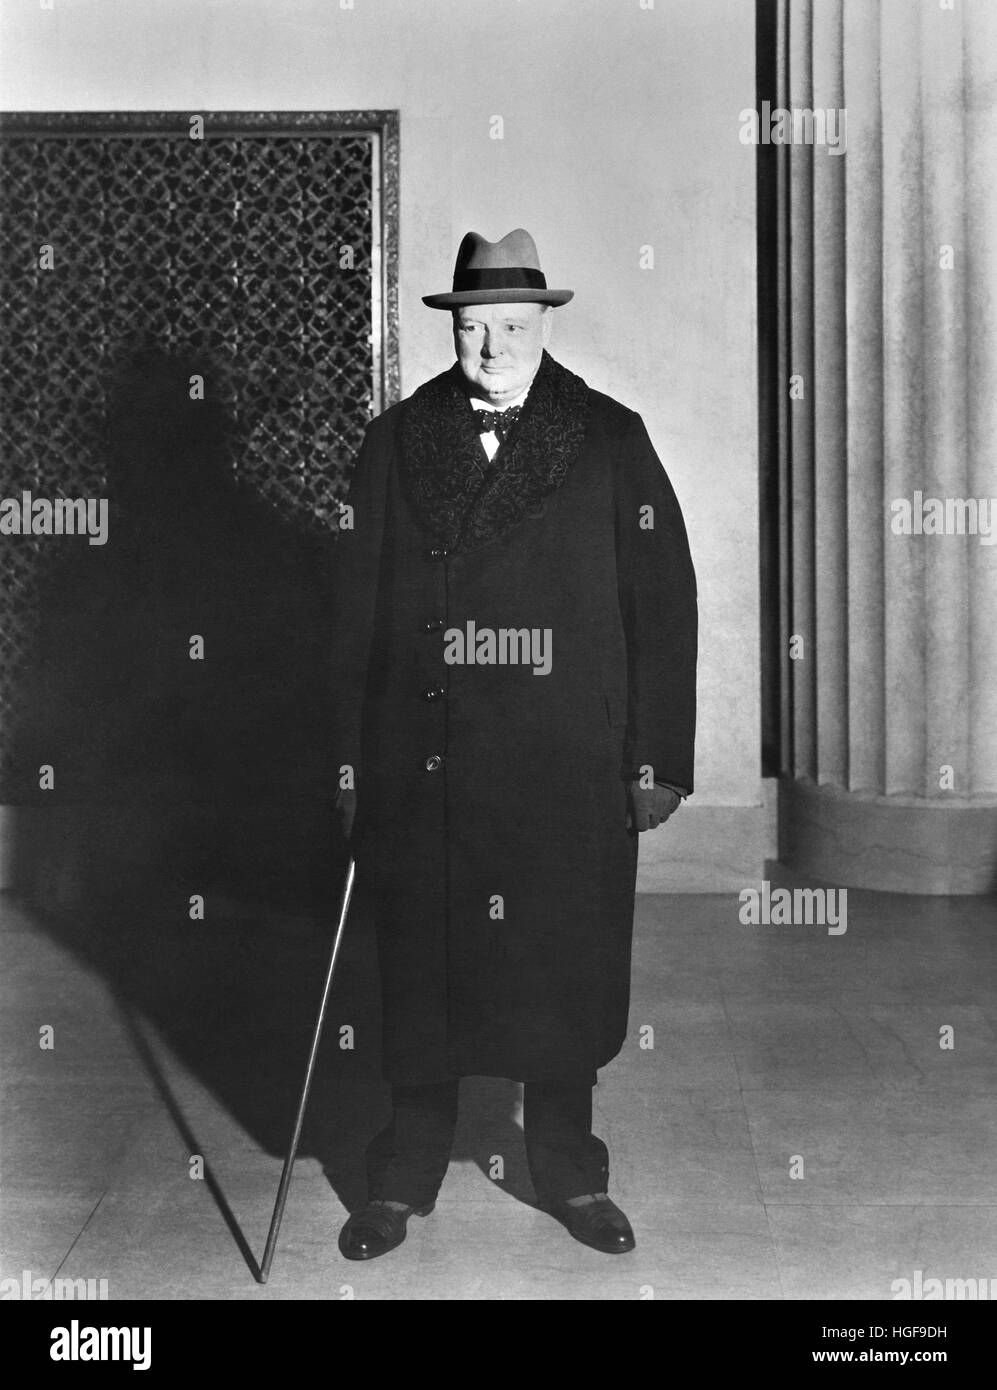 Churchill. 1939 - Stock Image